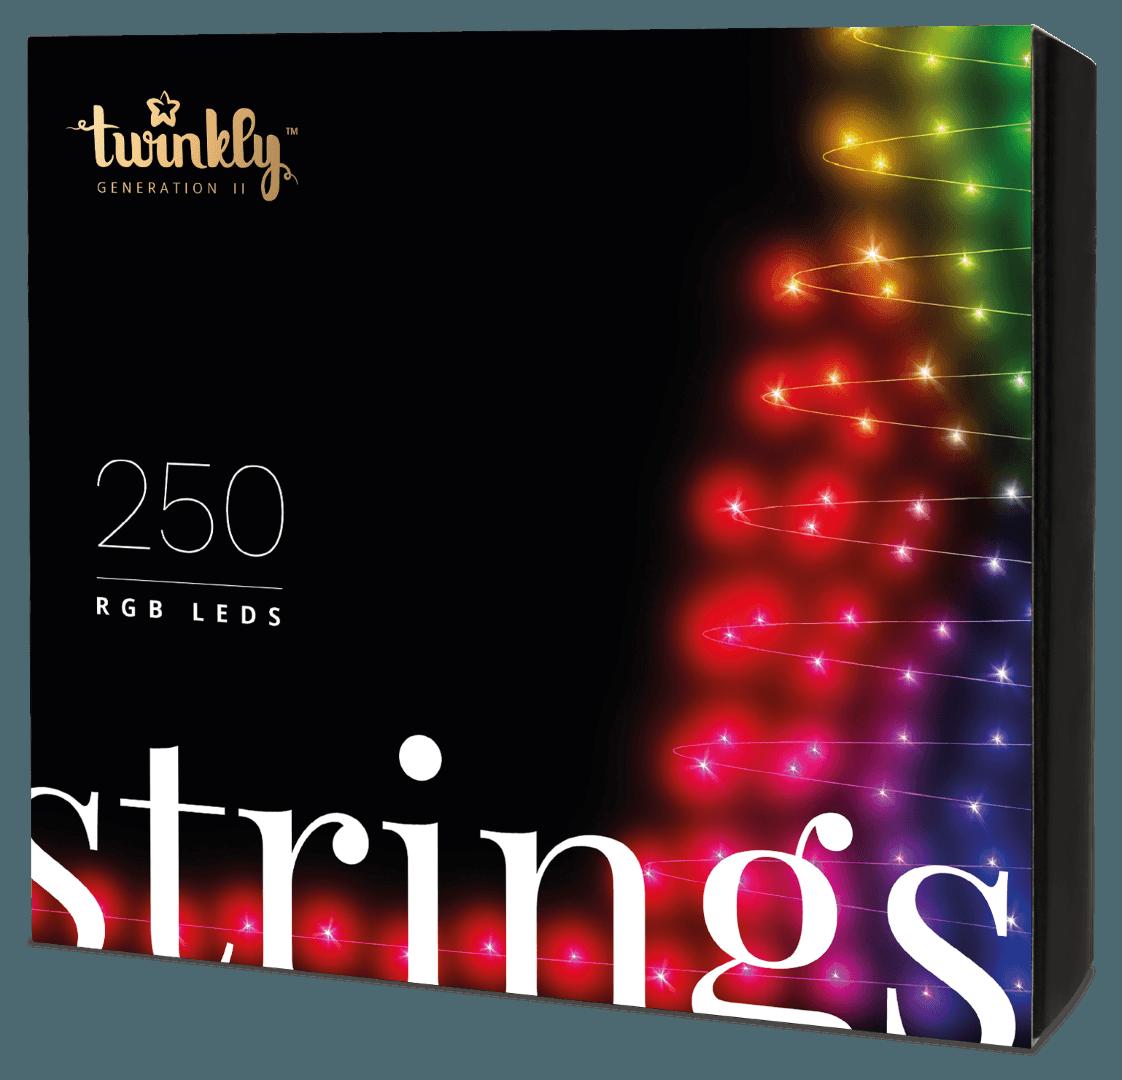 Twinkly 250 RGB LEDs Lights String - Generation II